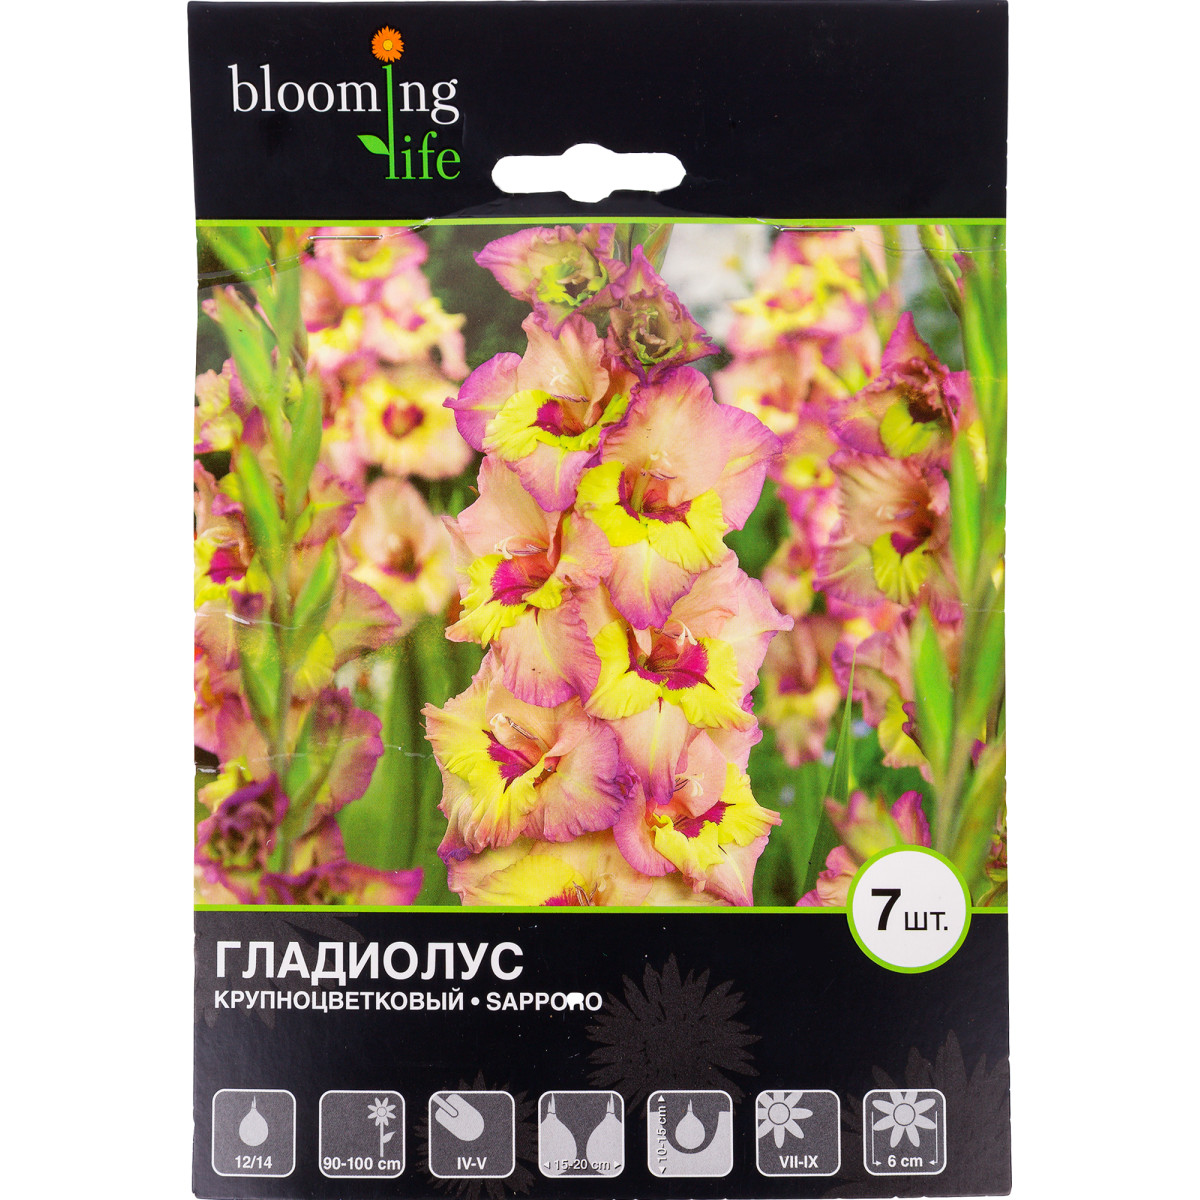 Гладиолус крупноцветковый «Саппоро»